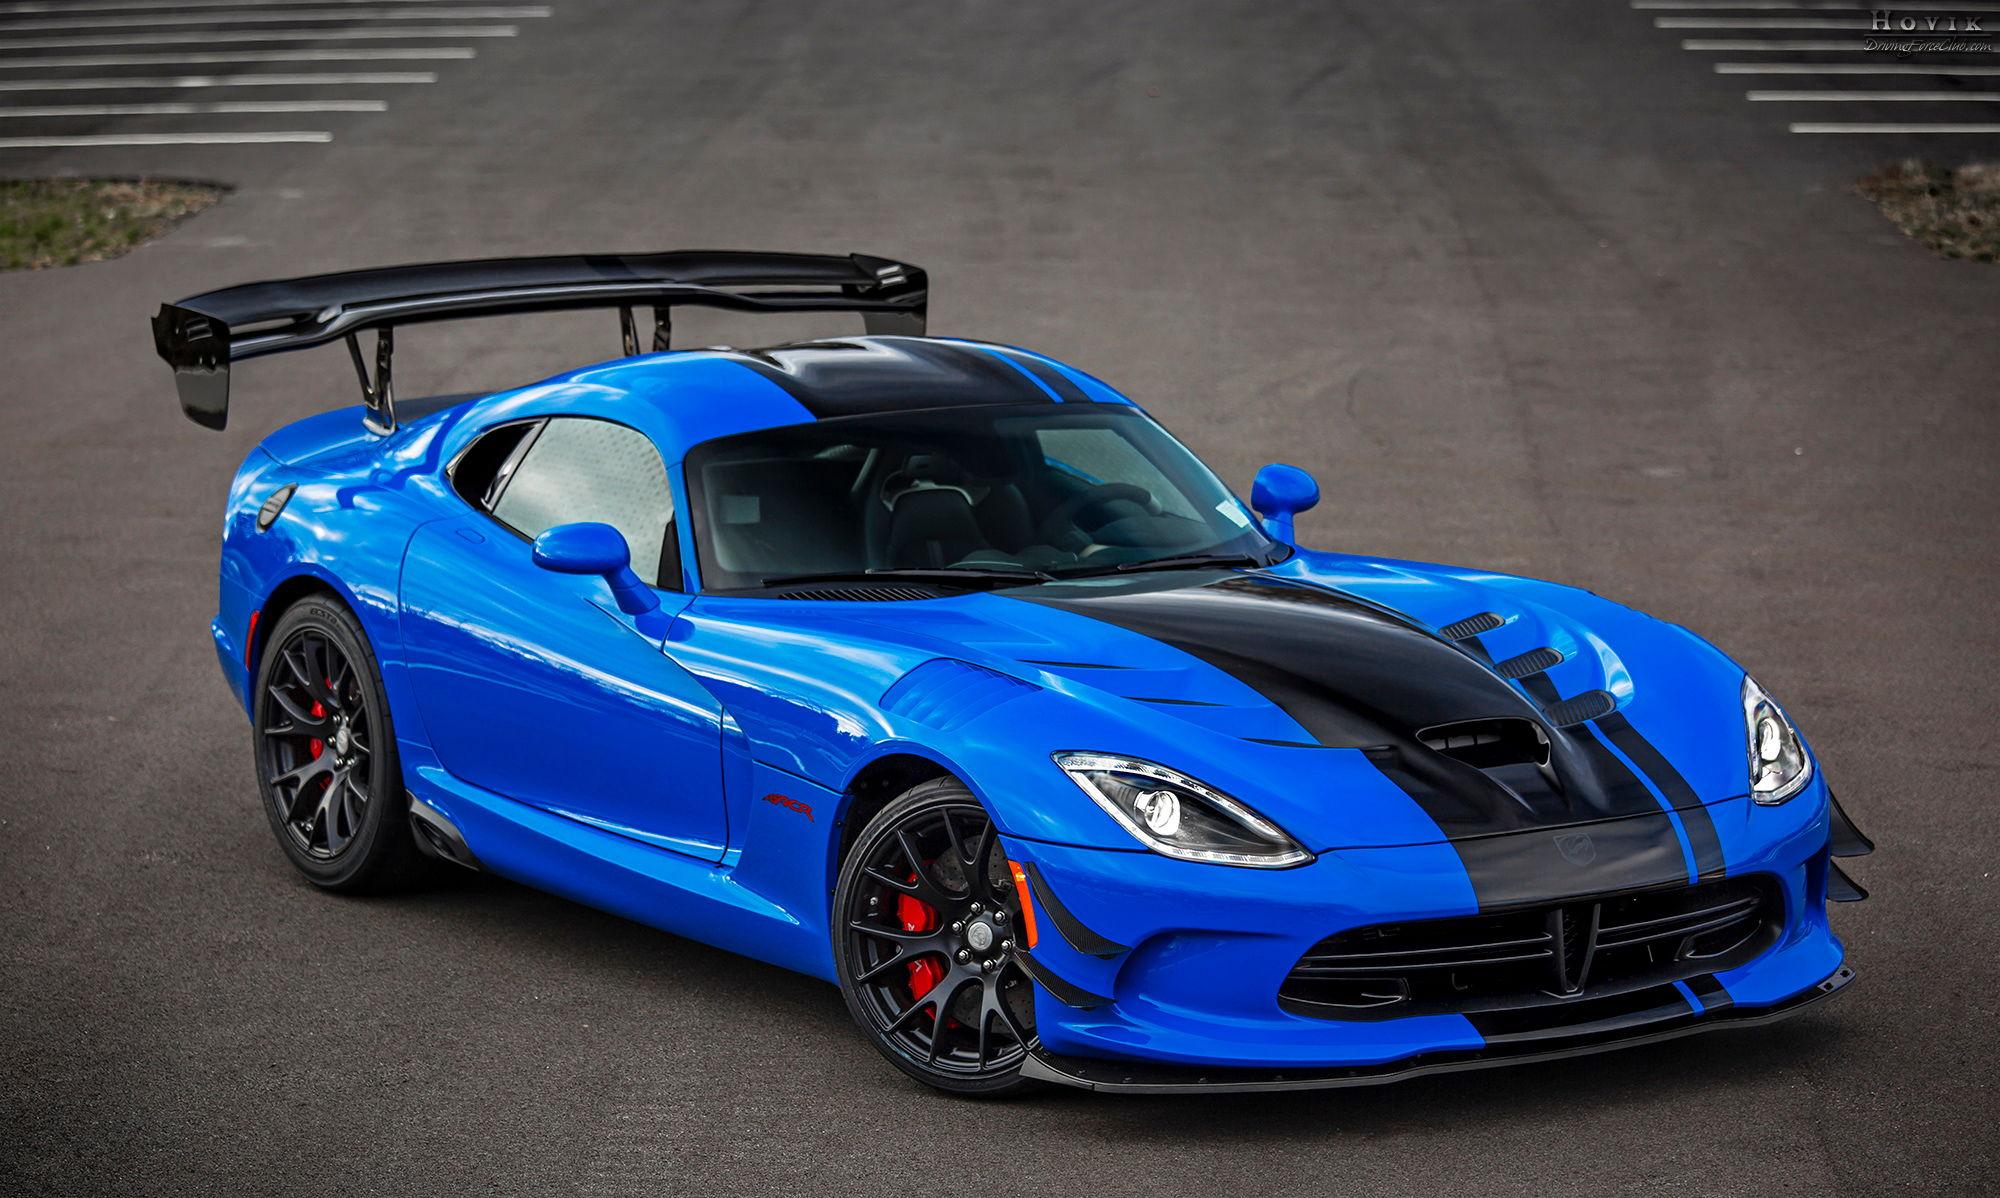 2017 the viper is done corvetteforum chevrolet corvette forum discussion. Black Bedroom Furniture Sets. Home Design Ideas